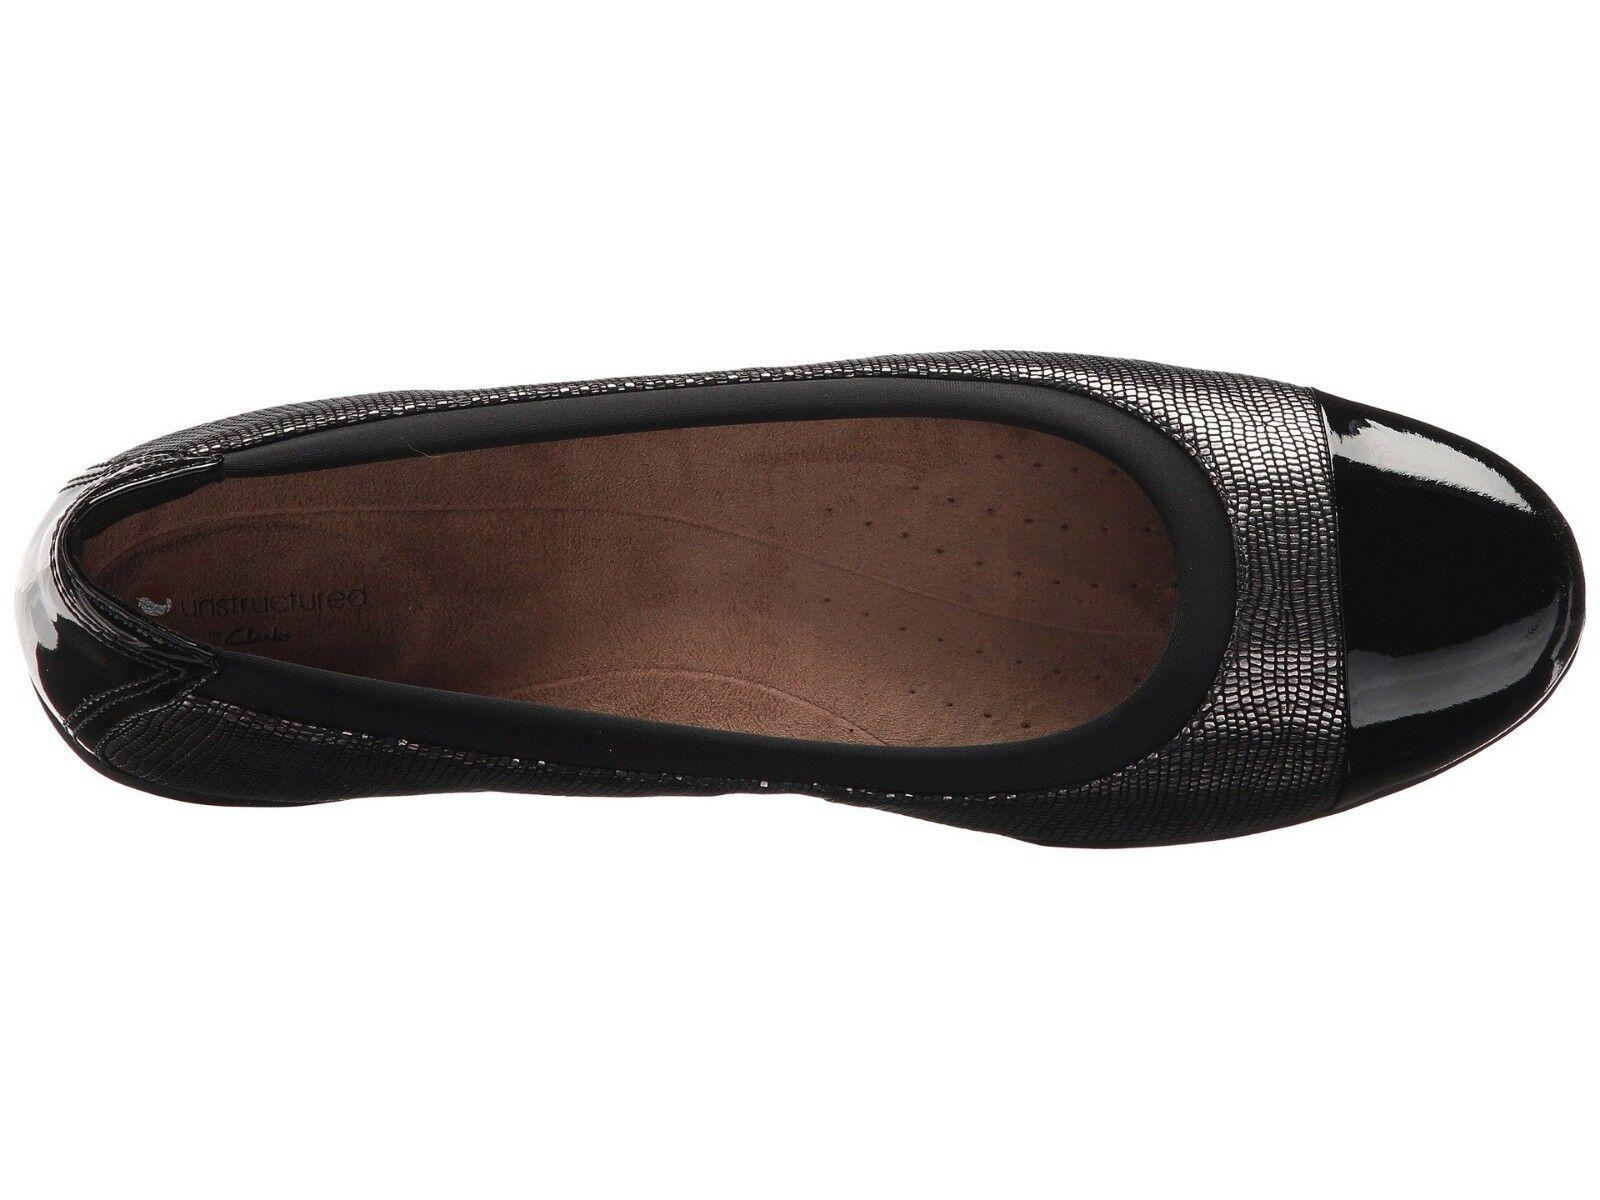 Women/'s Shoes Clarks NEENAH GARDEN Cap Toe Ballet Flats 32503 GUNMETAL *New*